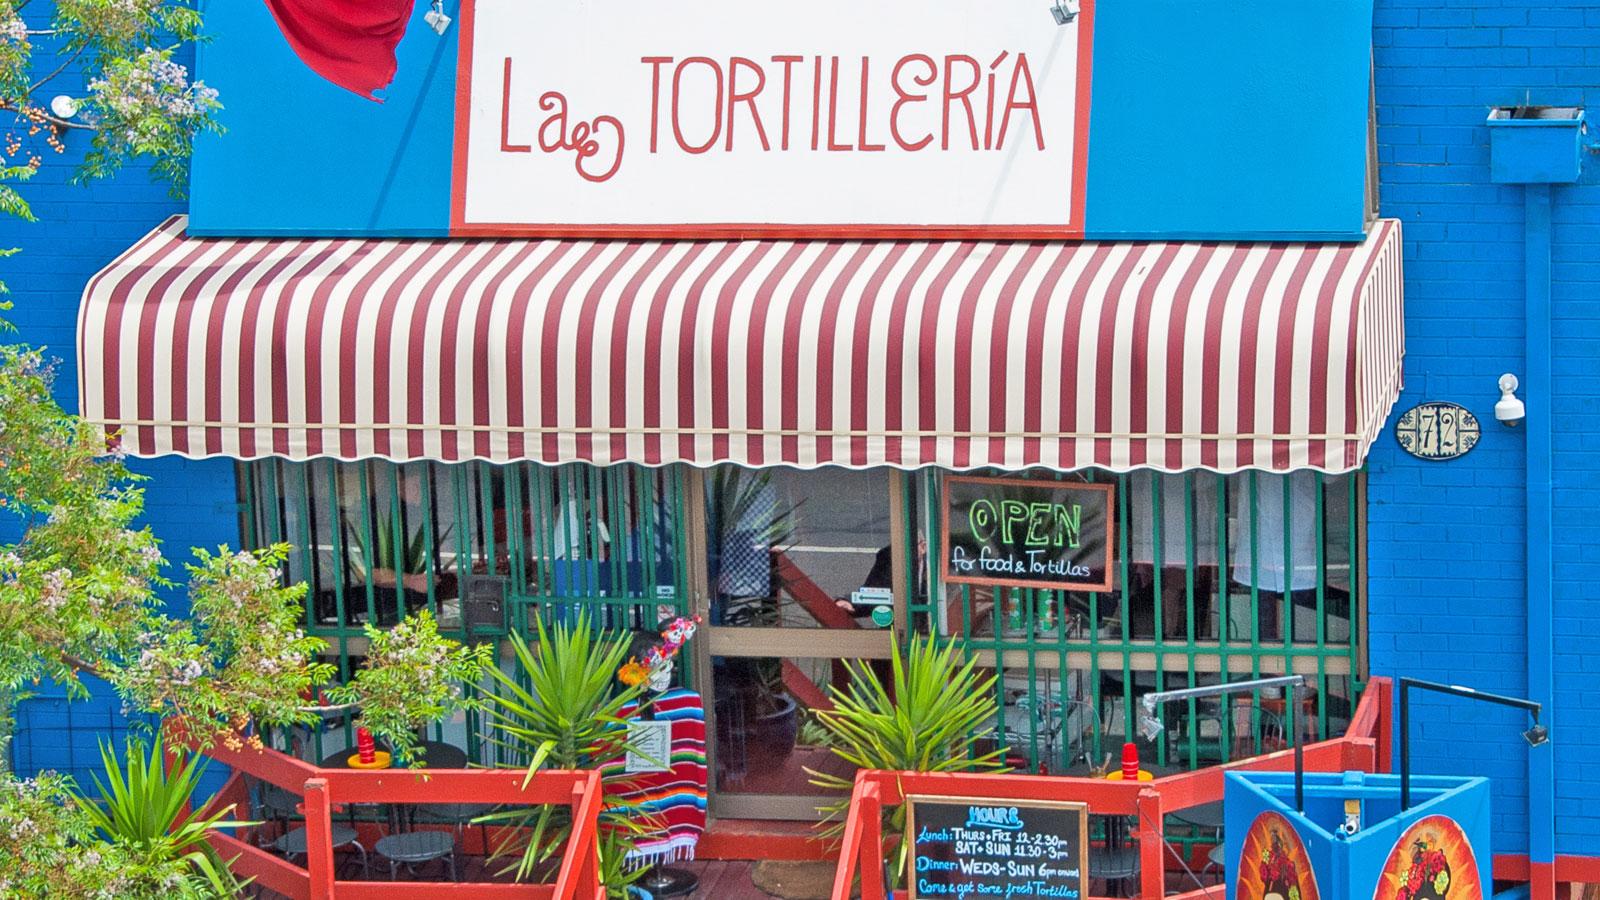 La Tortilleria, Kensington, Melbourne, Victoria, Australia